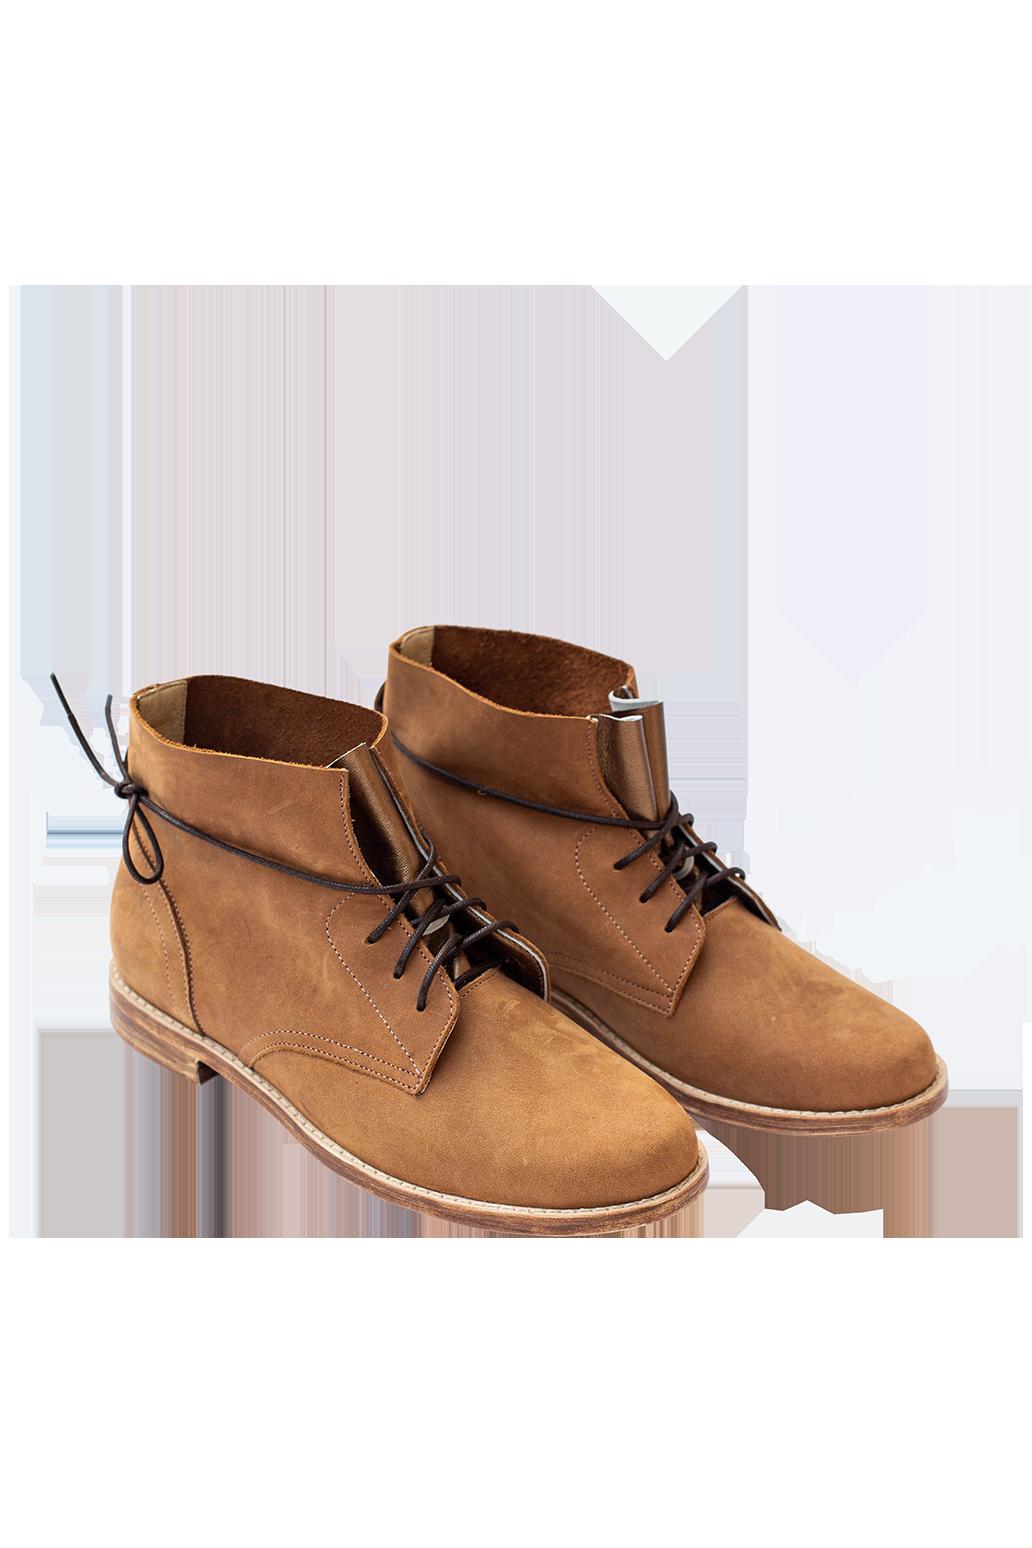 brown2-2